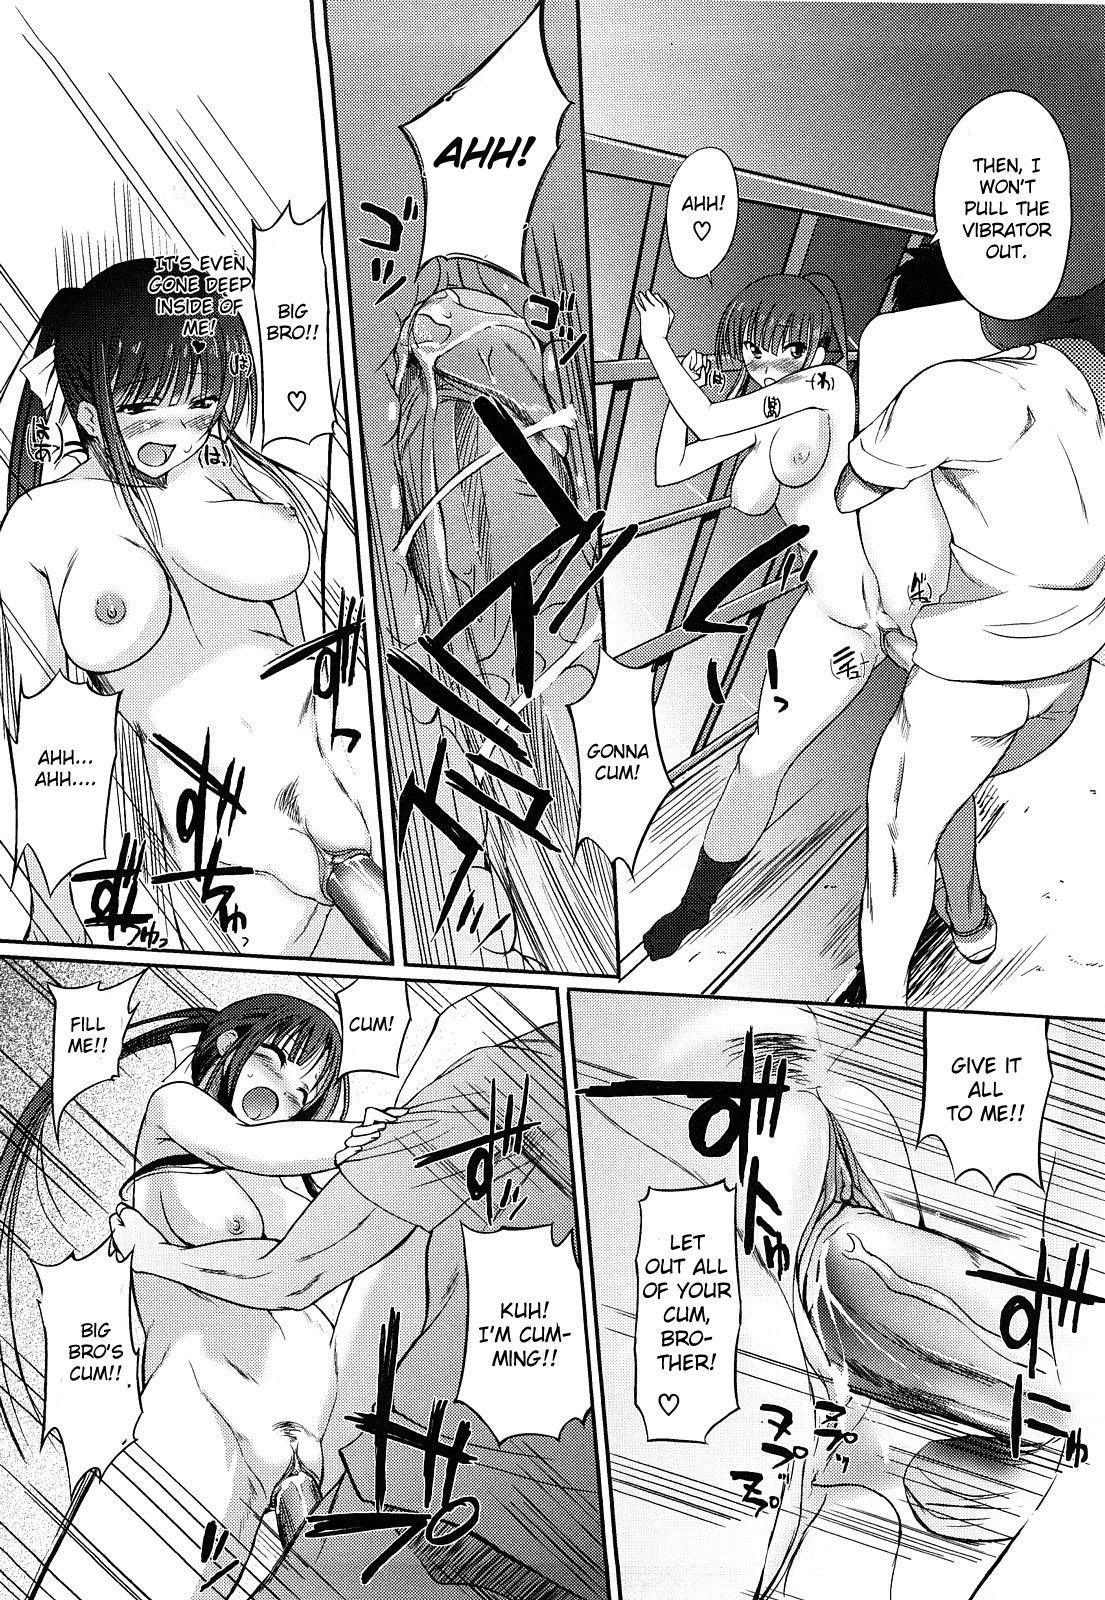 [Hanpera] Onee-san Whisper - Erotic Wisper [English] [CGRascal] [Decensored] 144